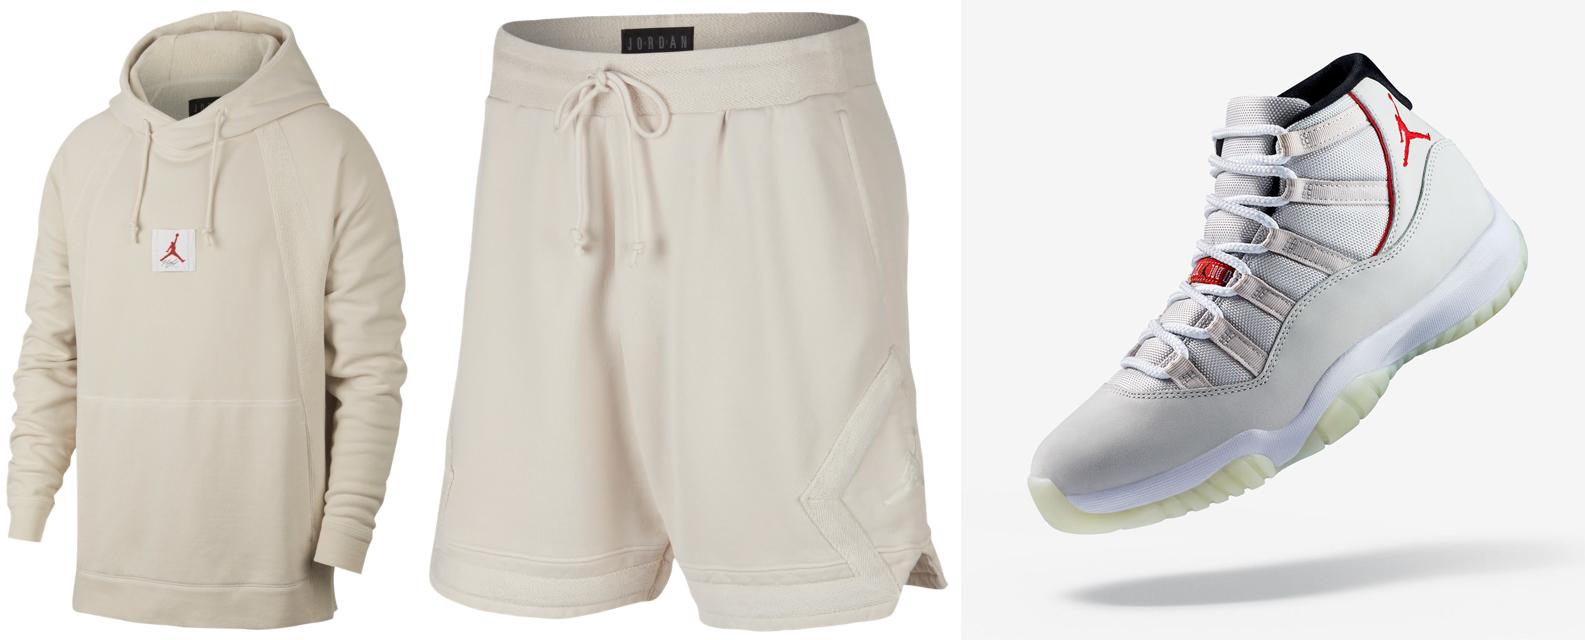 c1d9b46b36ac16 Air Jordan 11 Platinum Tint Clothing Match